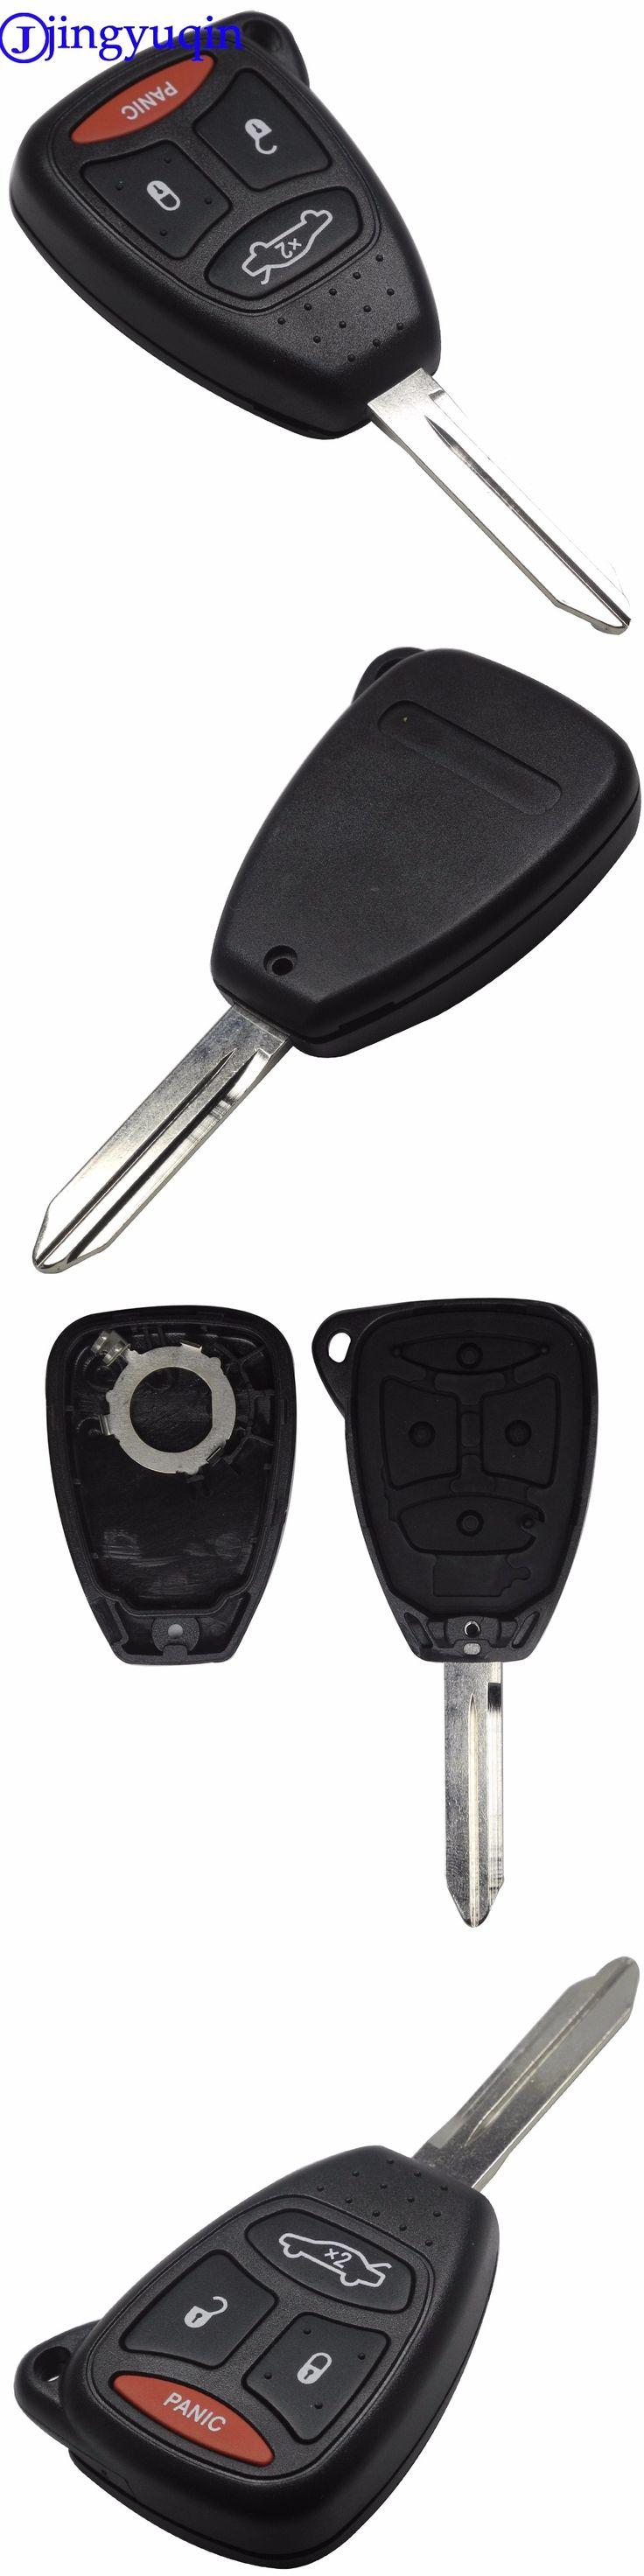 jingyuqin 4 Buttons Remote Car Key Shell Cover For Chrysler 300 Aspen For Dodge Dakota Durango For Jeep Grand Cherokee Commander